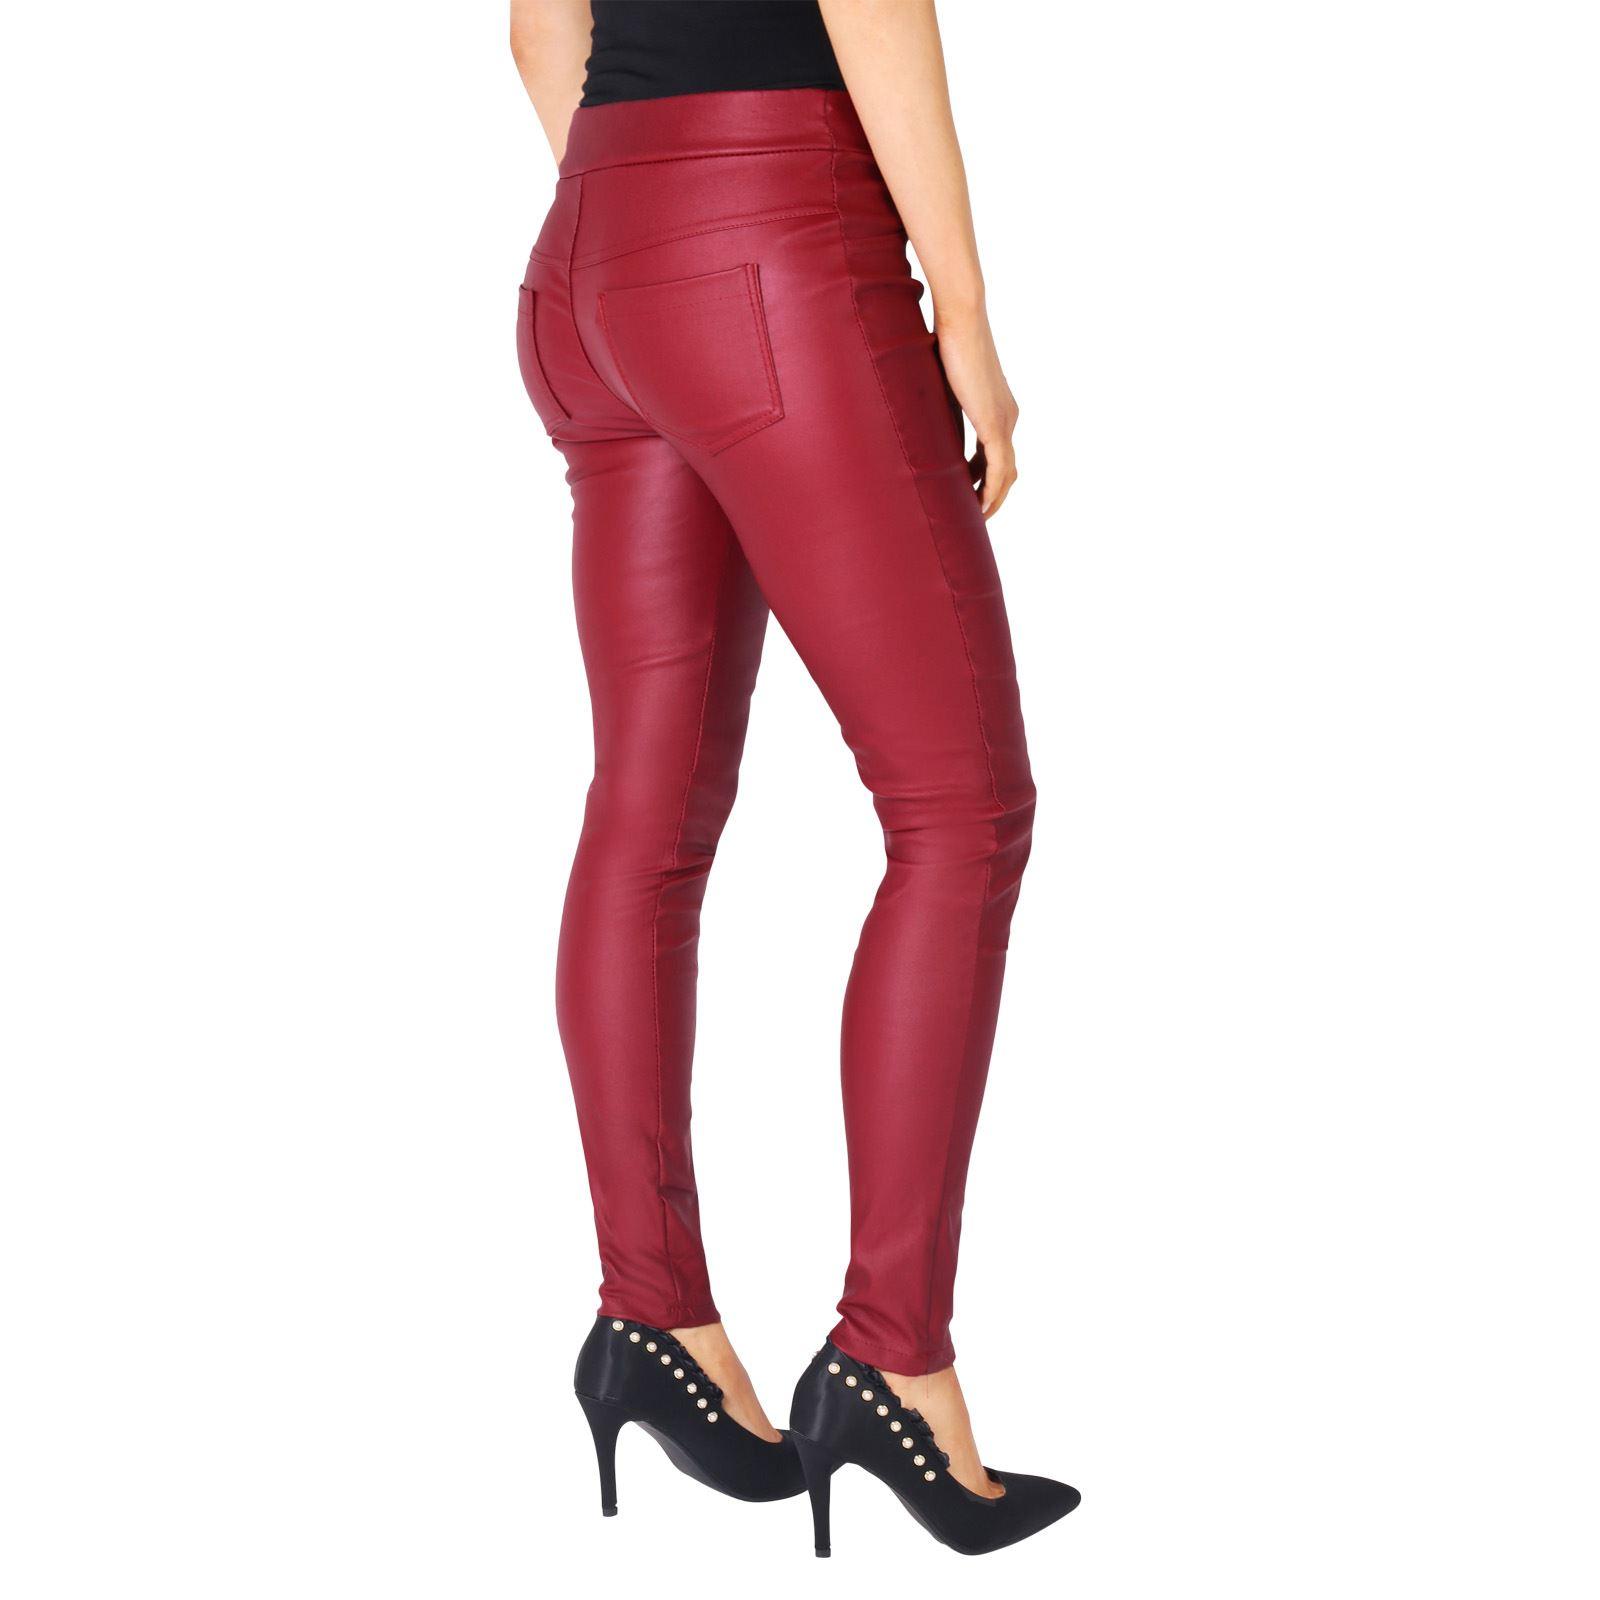 femmes legging pantalon slim jeans simili cuir extensible jegging taille haute ebay. Black Bedroom Furniture Sets. Home Design Ideas